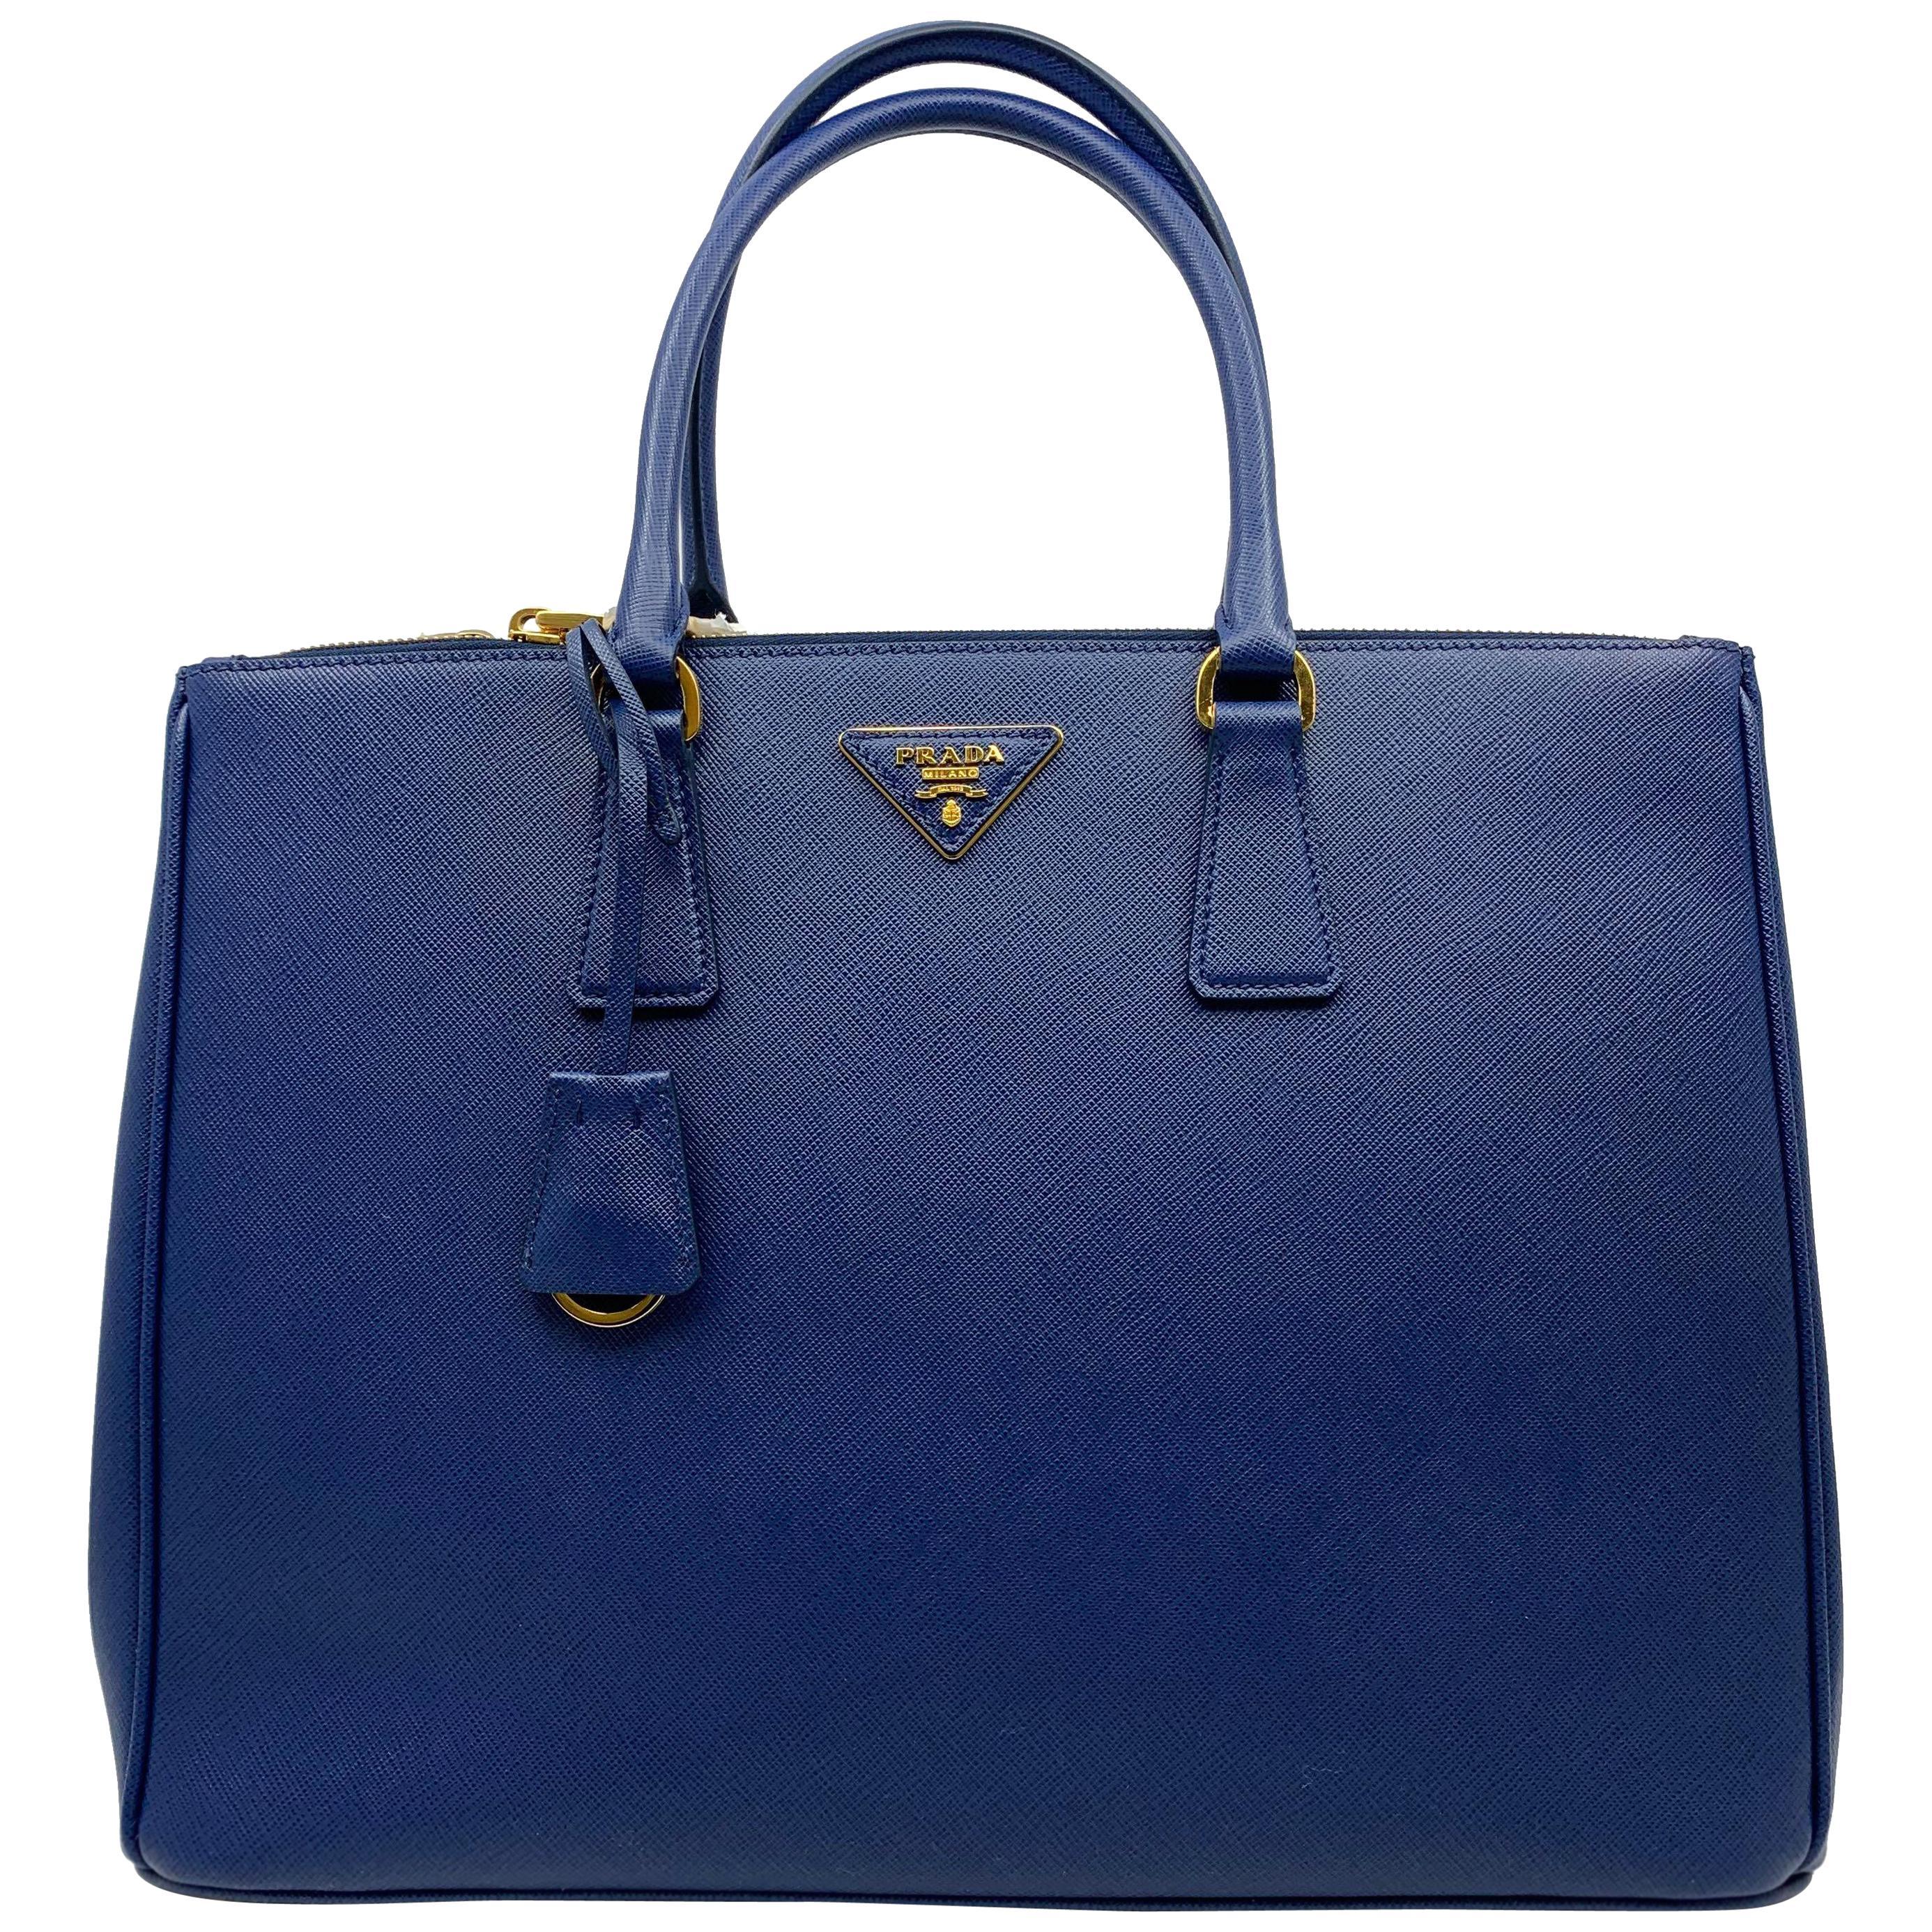 Prada Blue Lux Saffiano Leather Double-Zip Tote Ladies Bag 1BA786 F0016